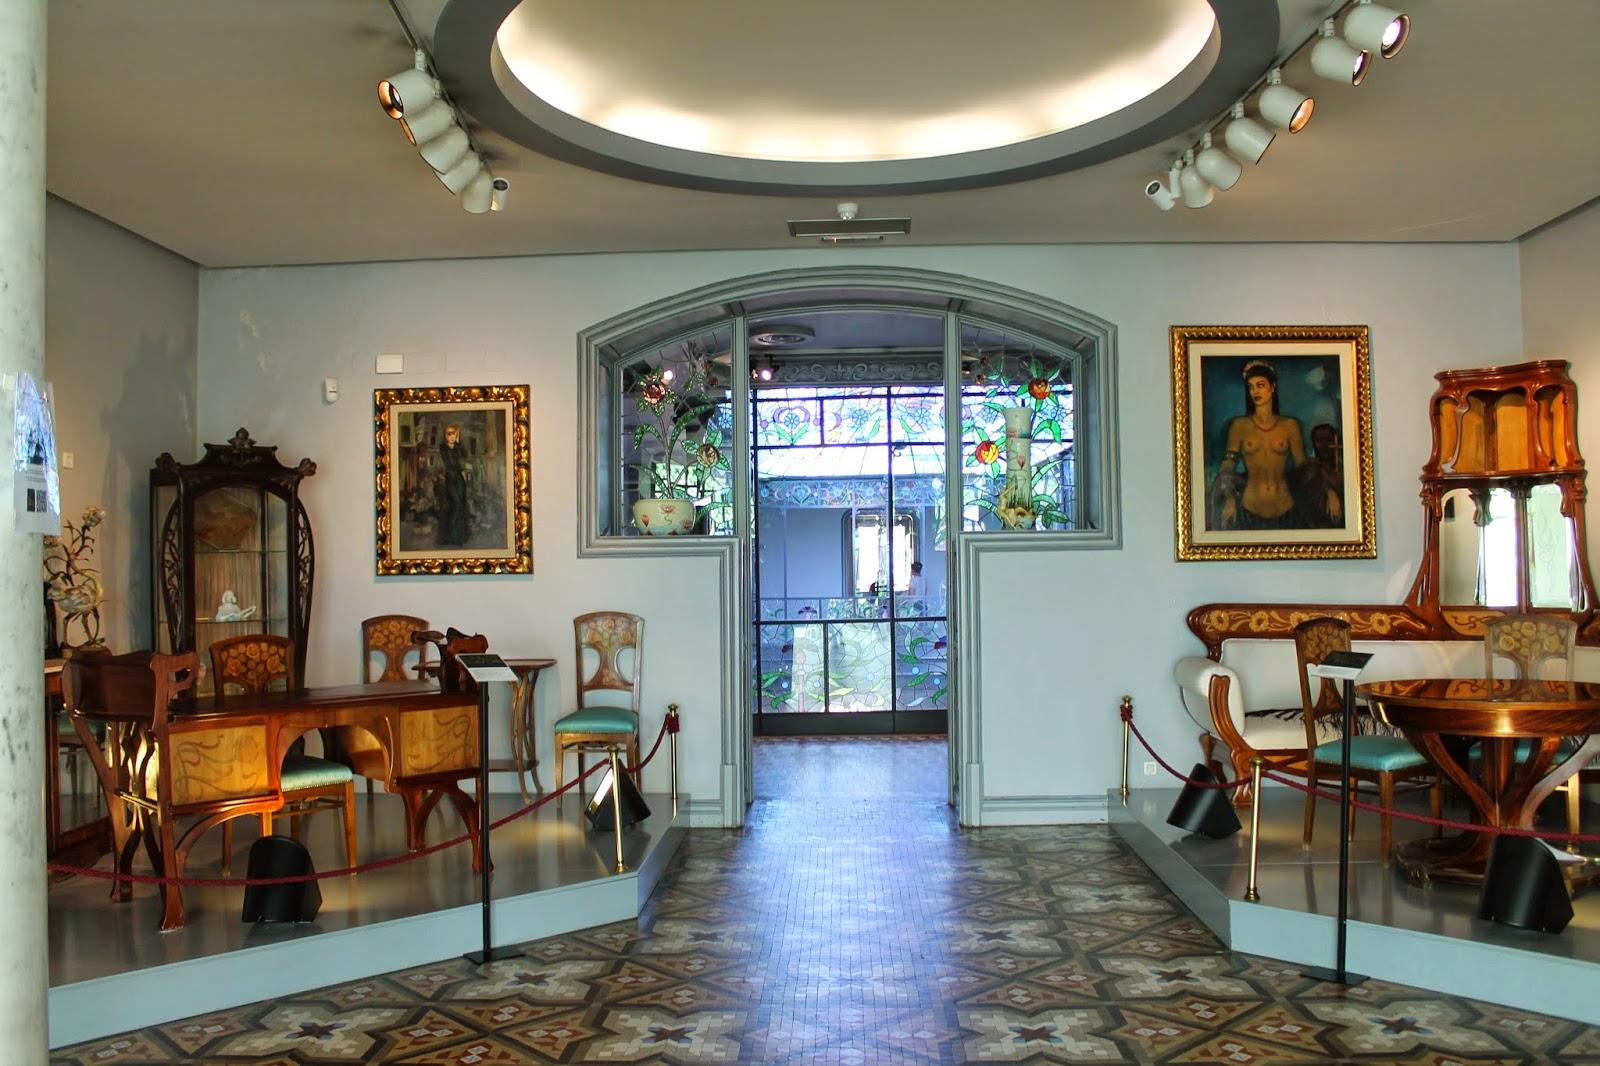 Museo casa lis en salamanca la maleta de constanza - La casa lis de salamanca ...